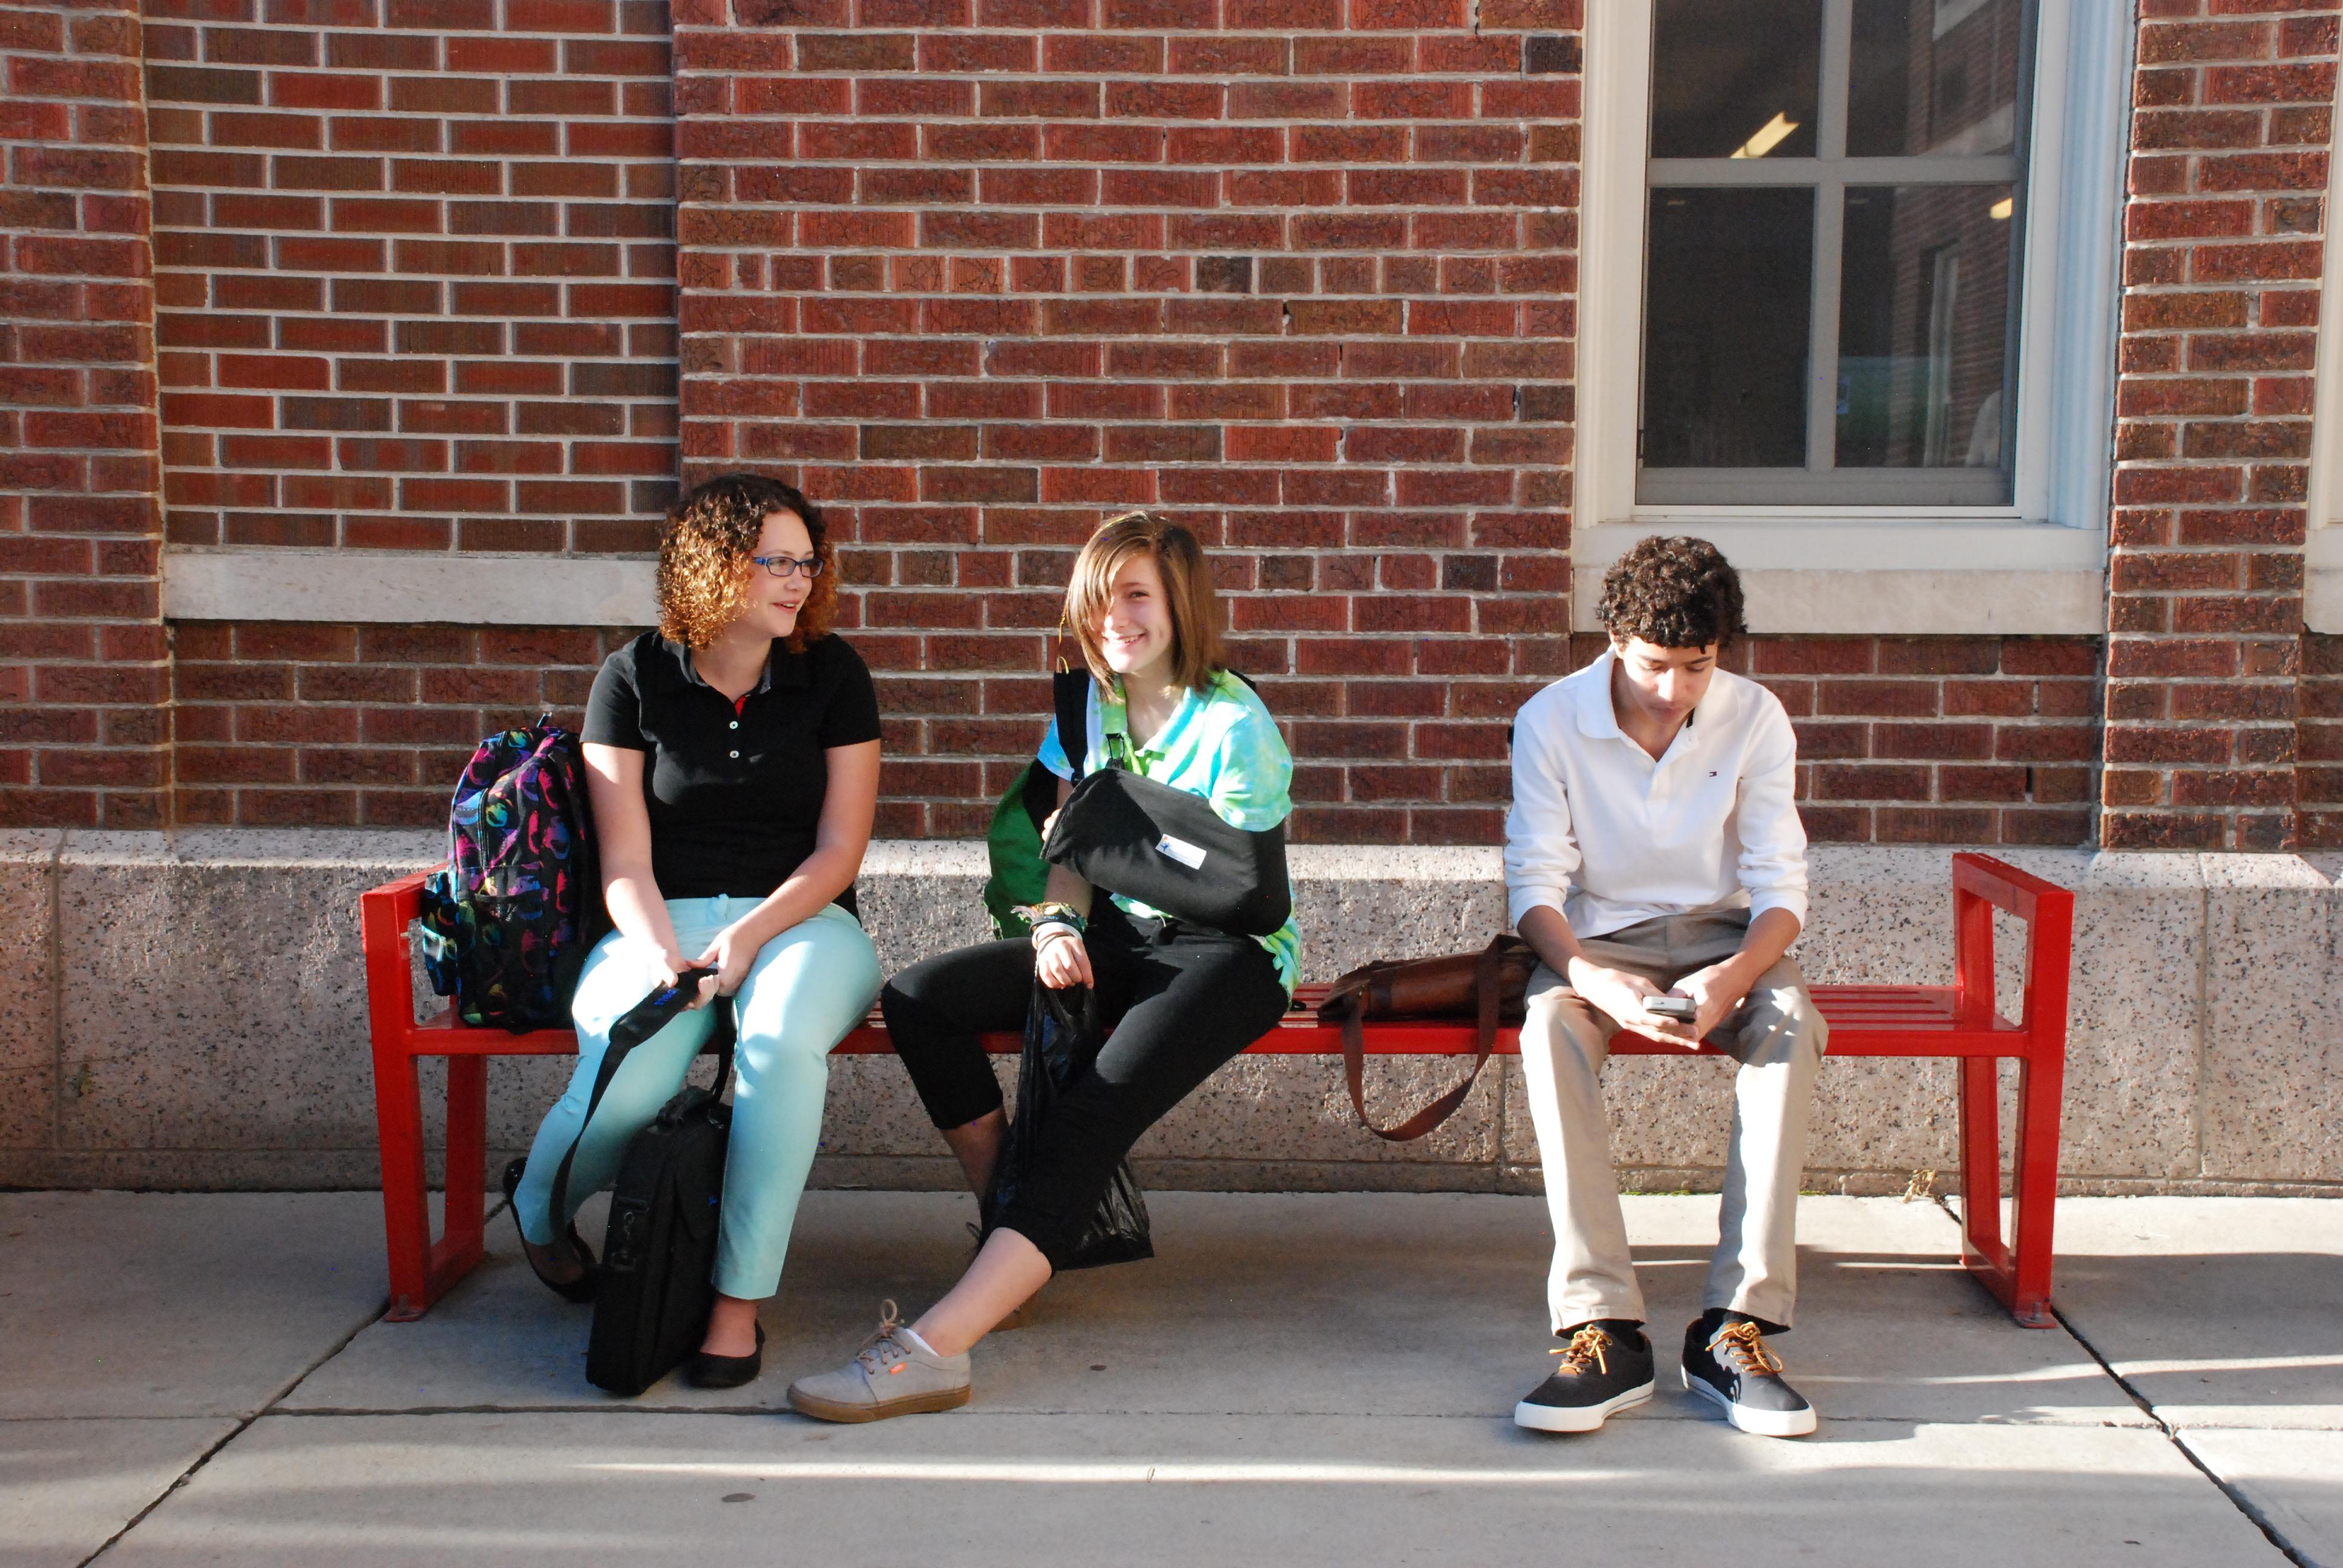 Freshman wait for school to start at DSST Cole High.